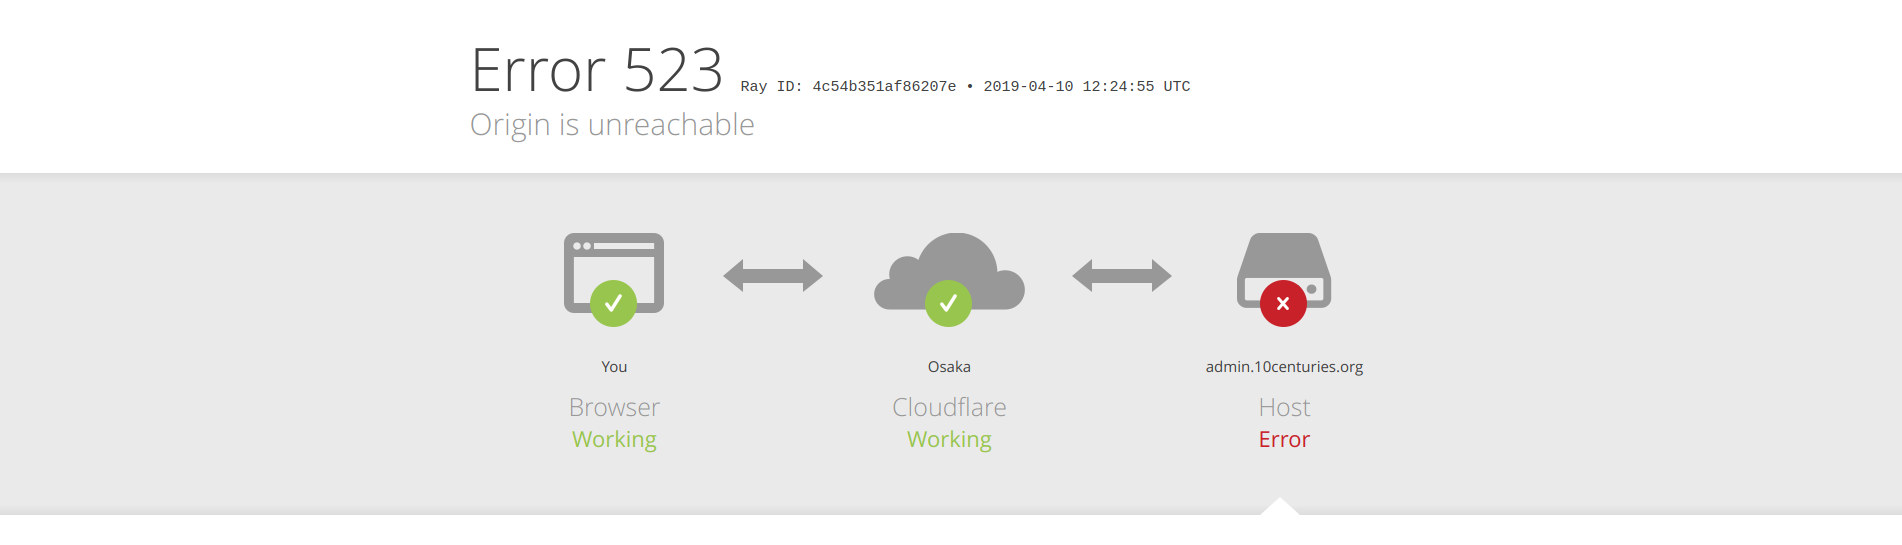 Cloudflare's Dreaded Error 523